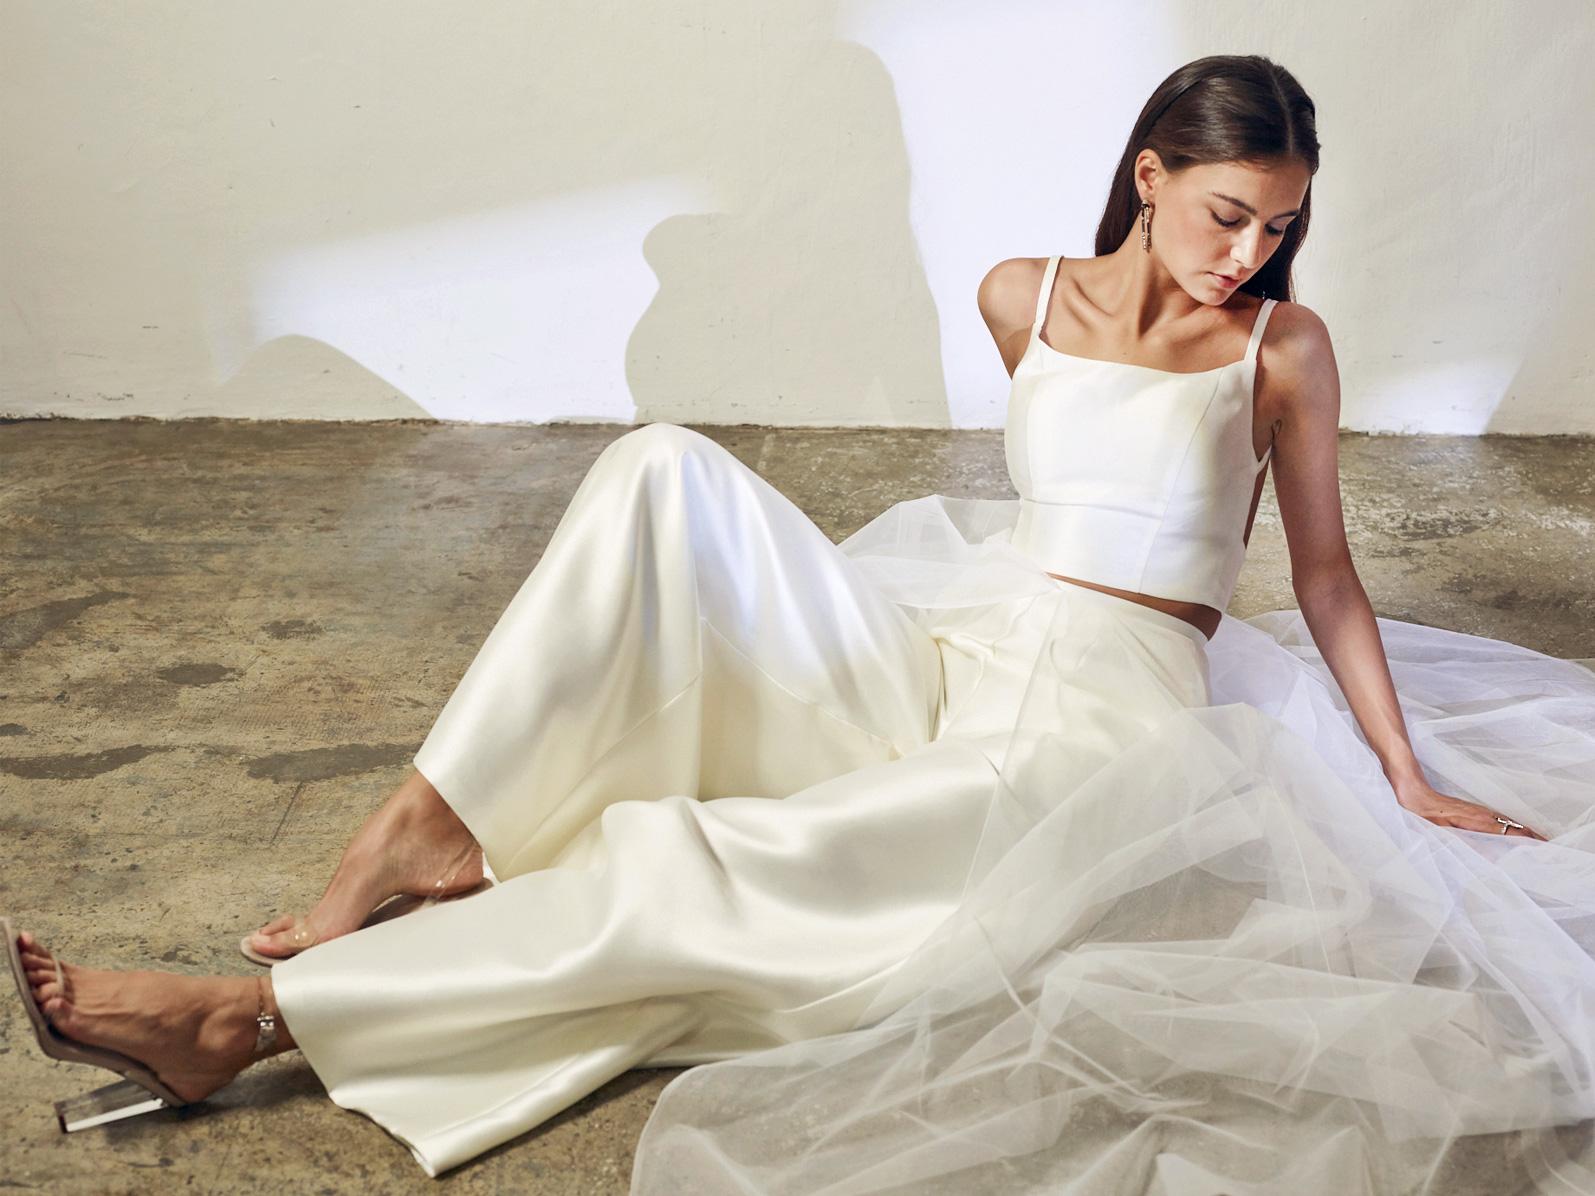 gown rental Singapore -- Love, Fioyo